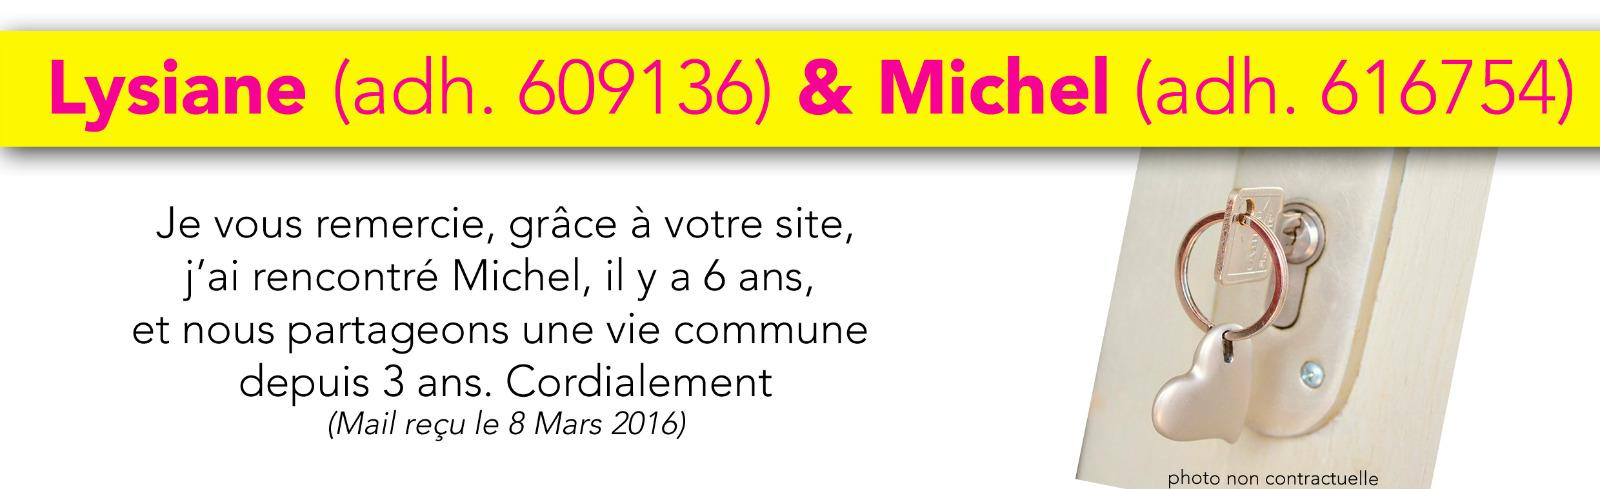 lysiane-et-michel-adh-59-remerciement-unicentre